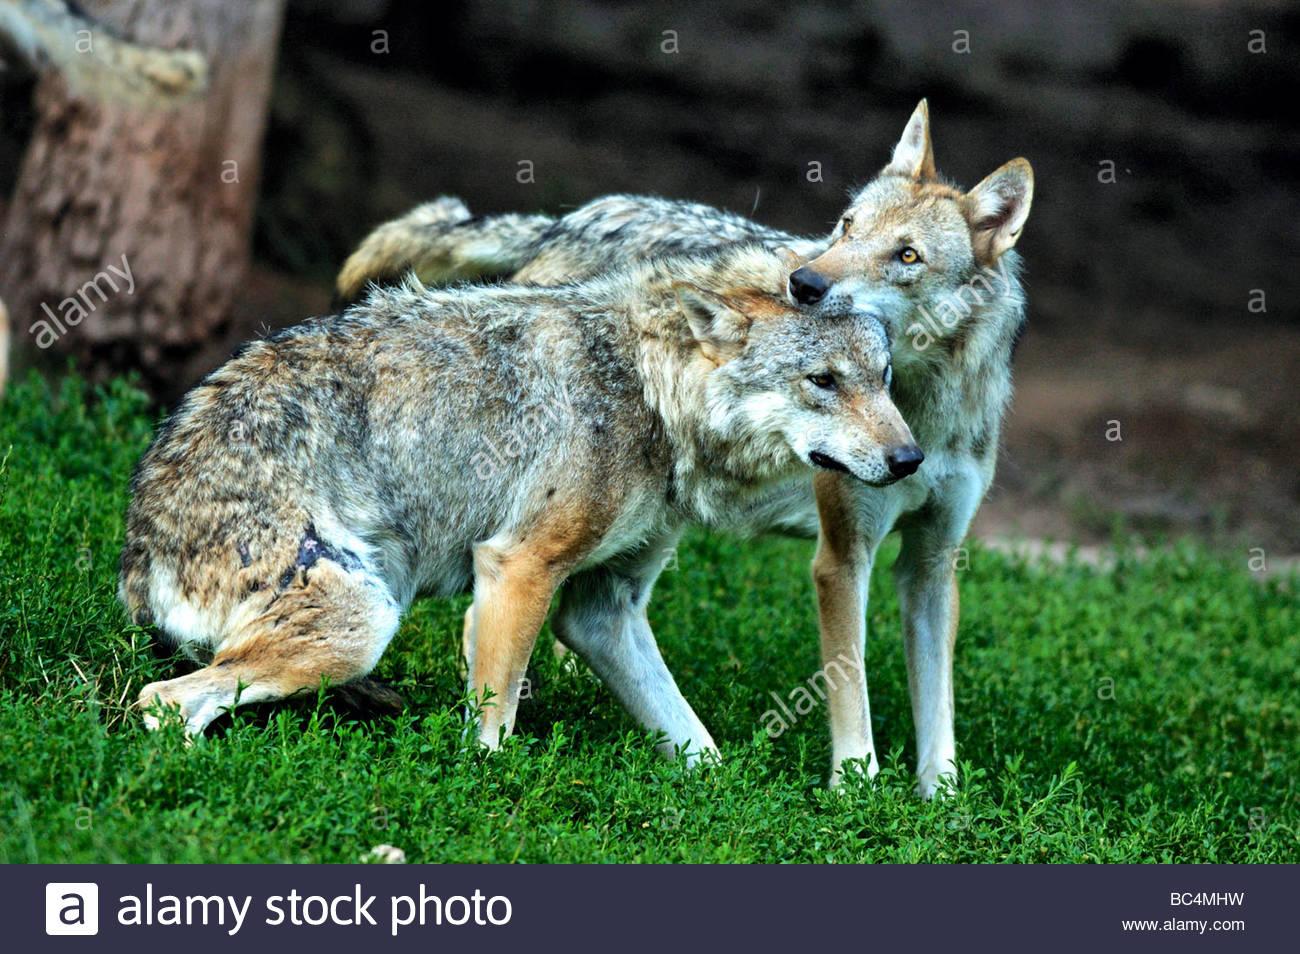 Mackenzie valley wolf - photo#51